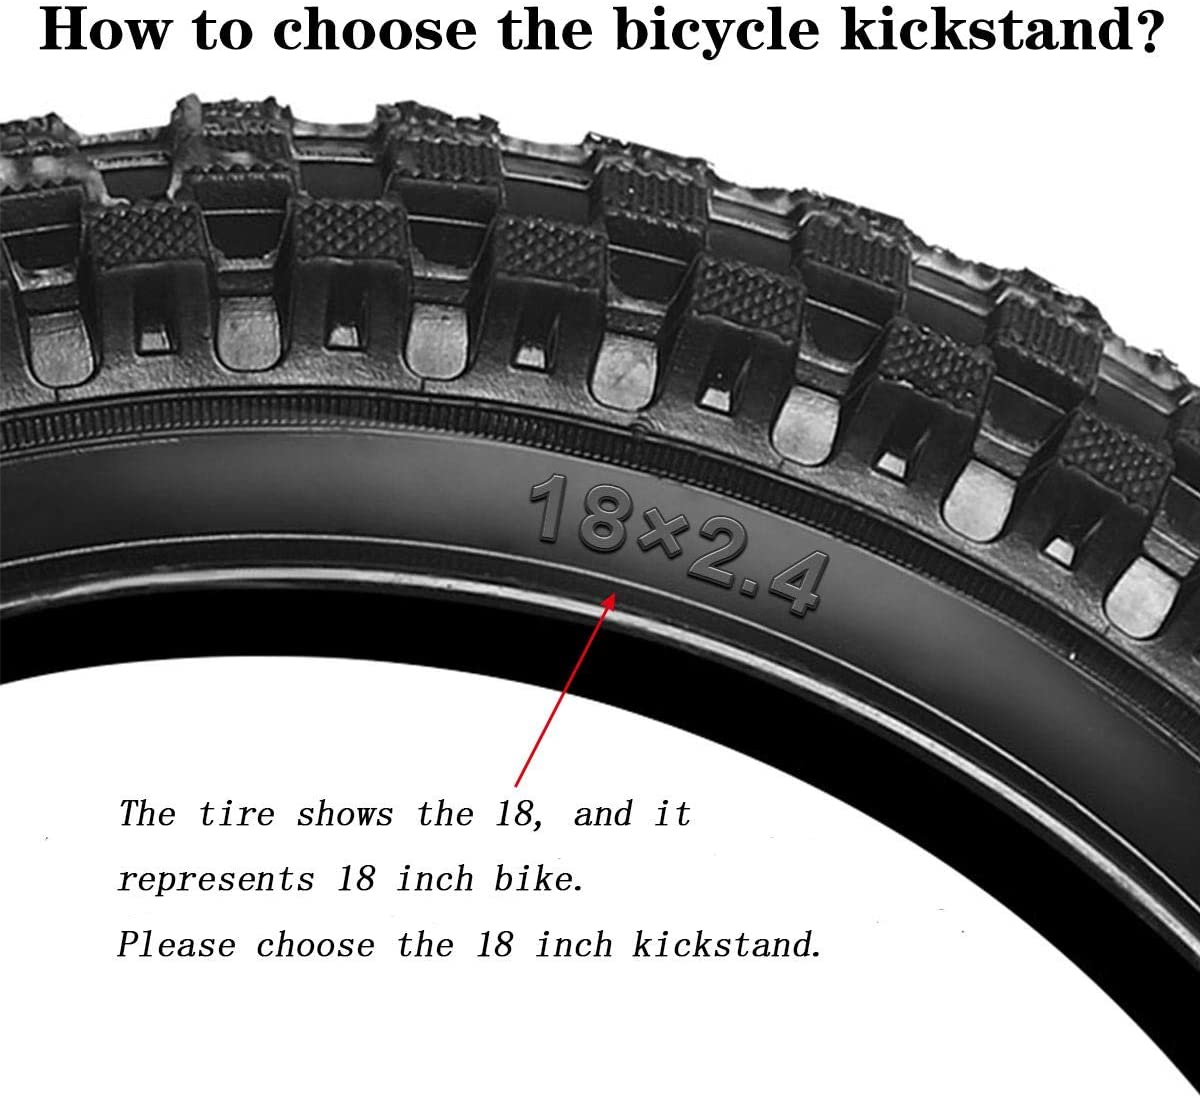 CYFIE Bike Kickstand with Pad Bike Stand Kids Bicycle Kickstand Support Steel Rear Wheel Kickstands